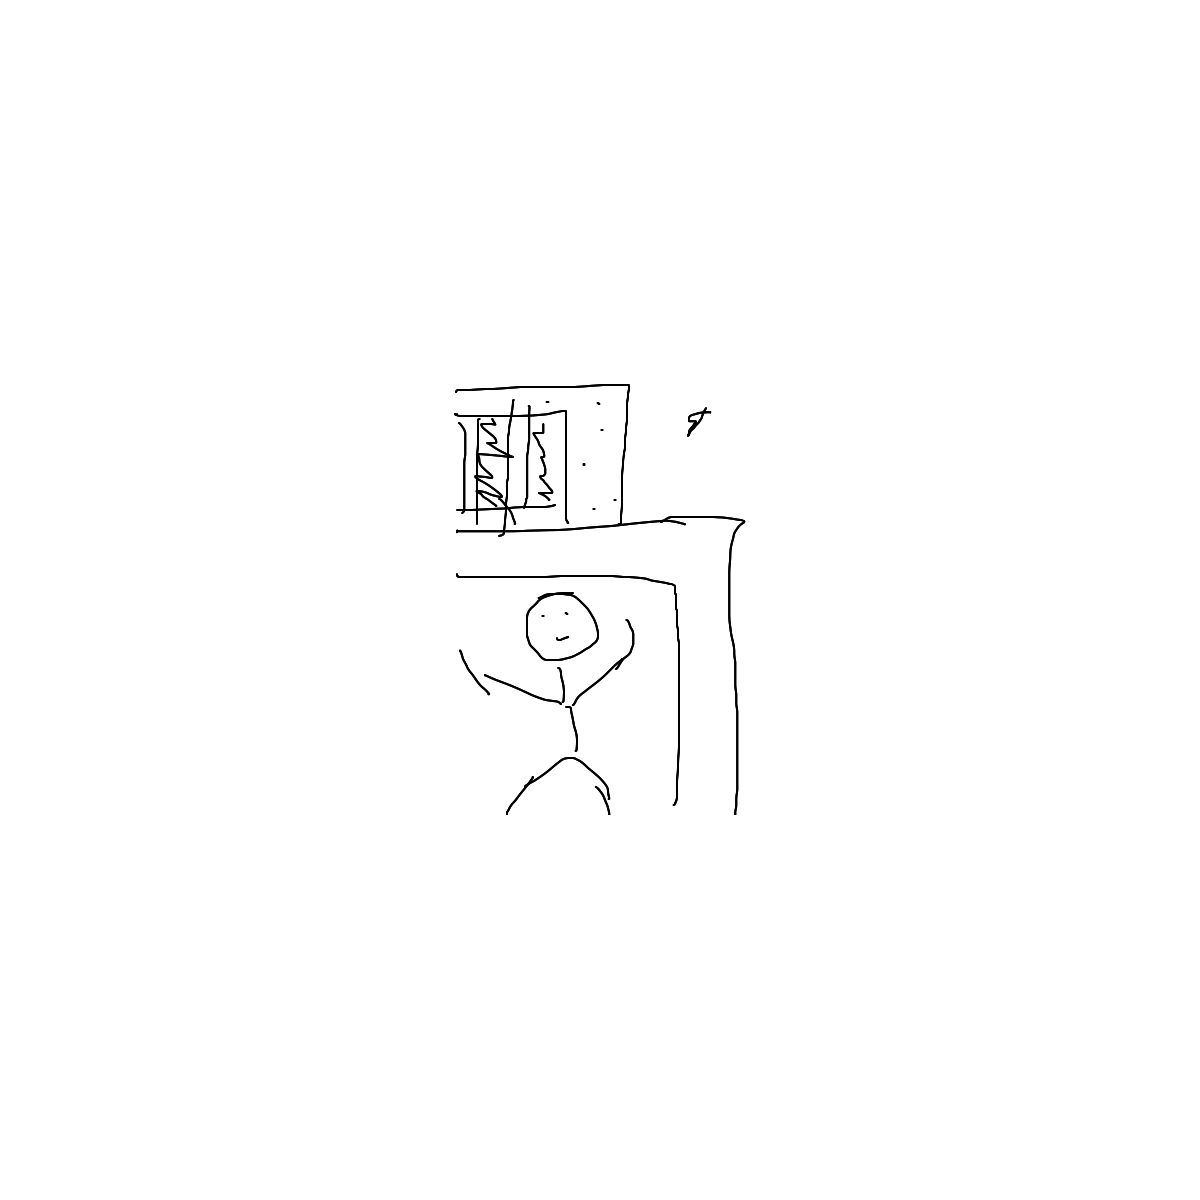 BAAAM drawing#23106 lat:6.4270186424255370lng: 3.4238386154174805